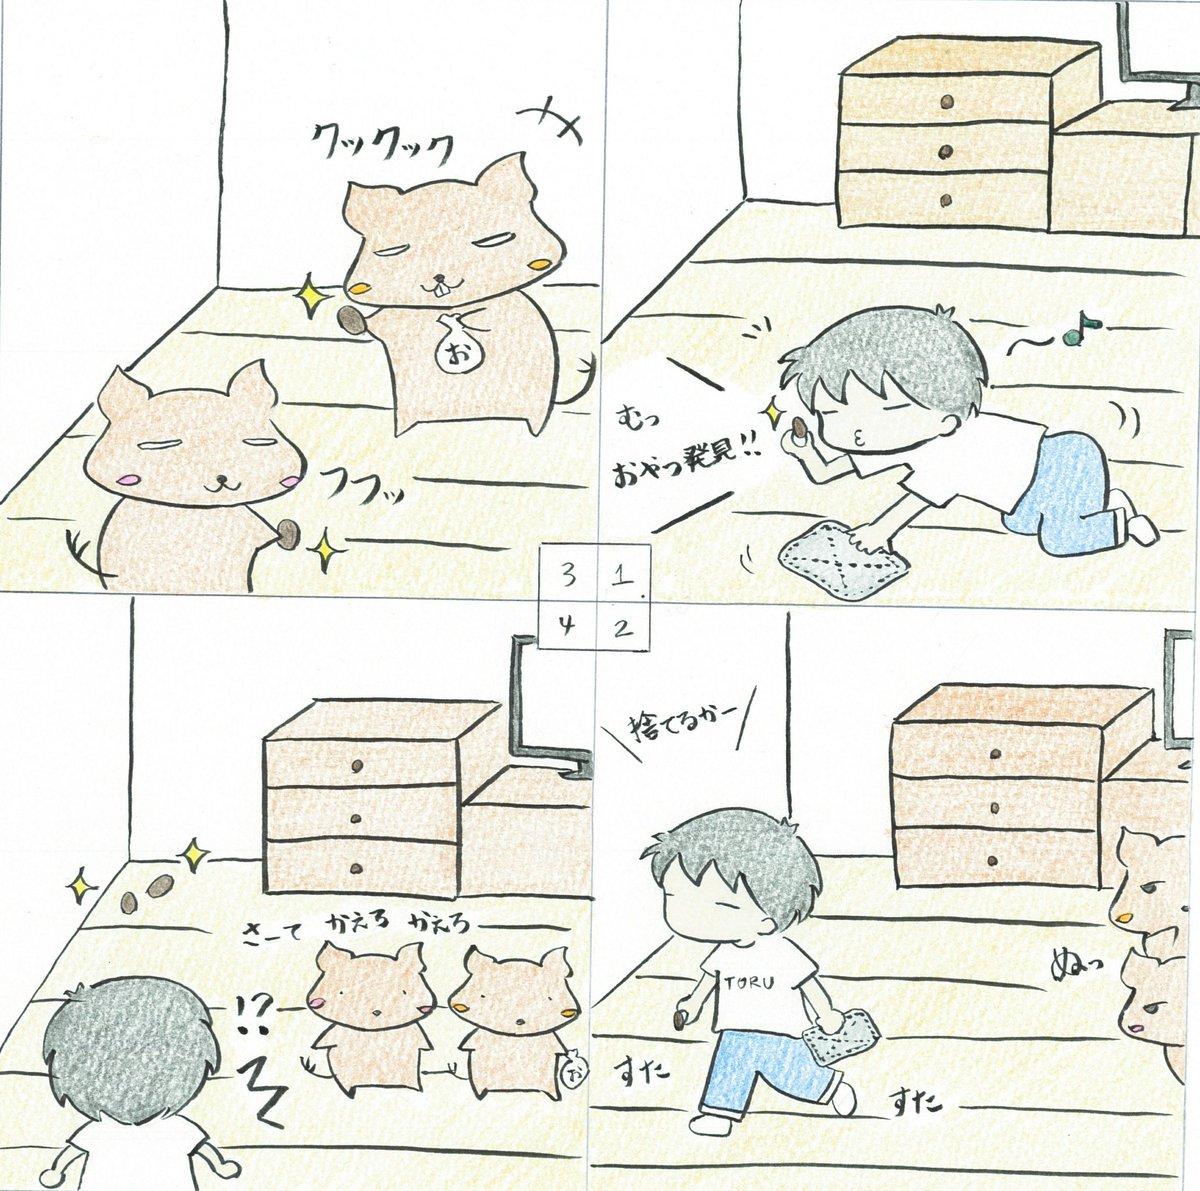 "toru@デグーと暮らしてます on twitter: ""いくら掃除しても部屋の"